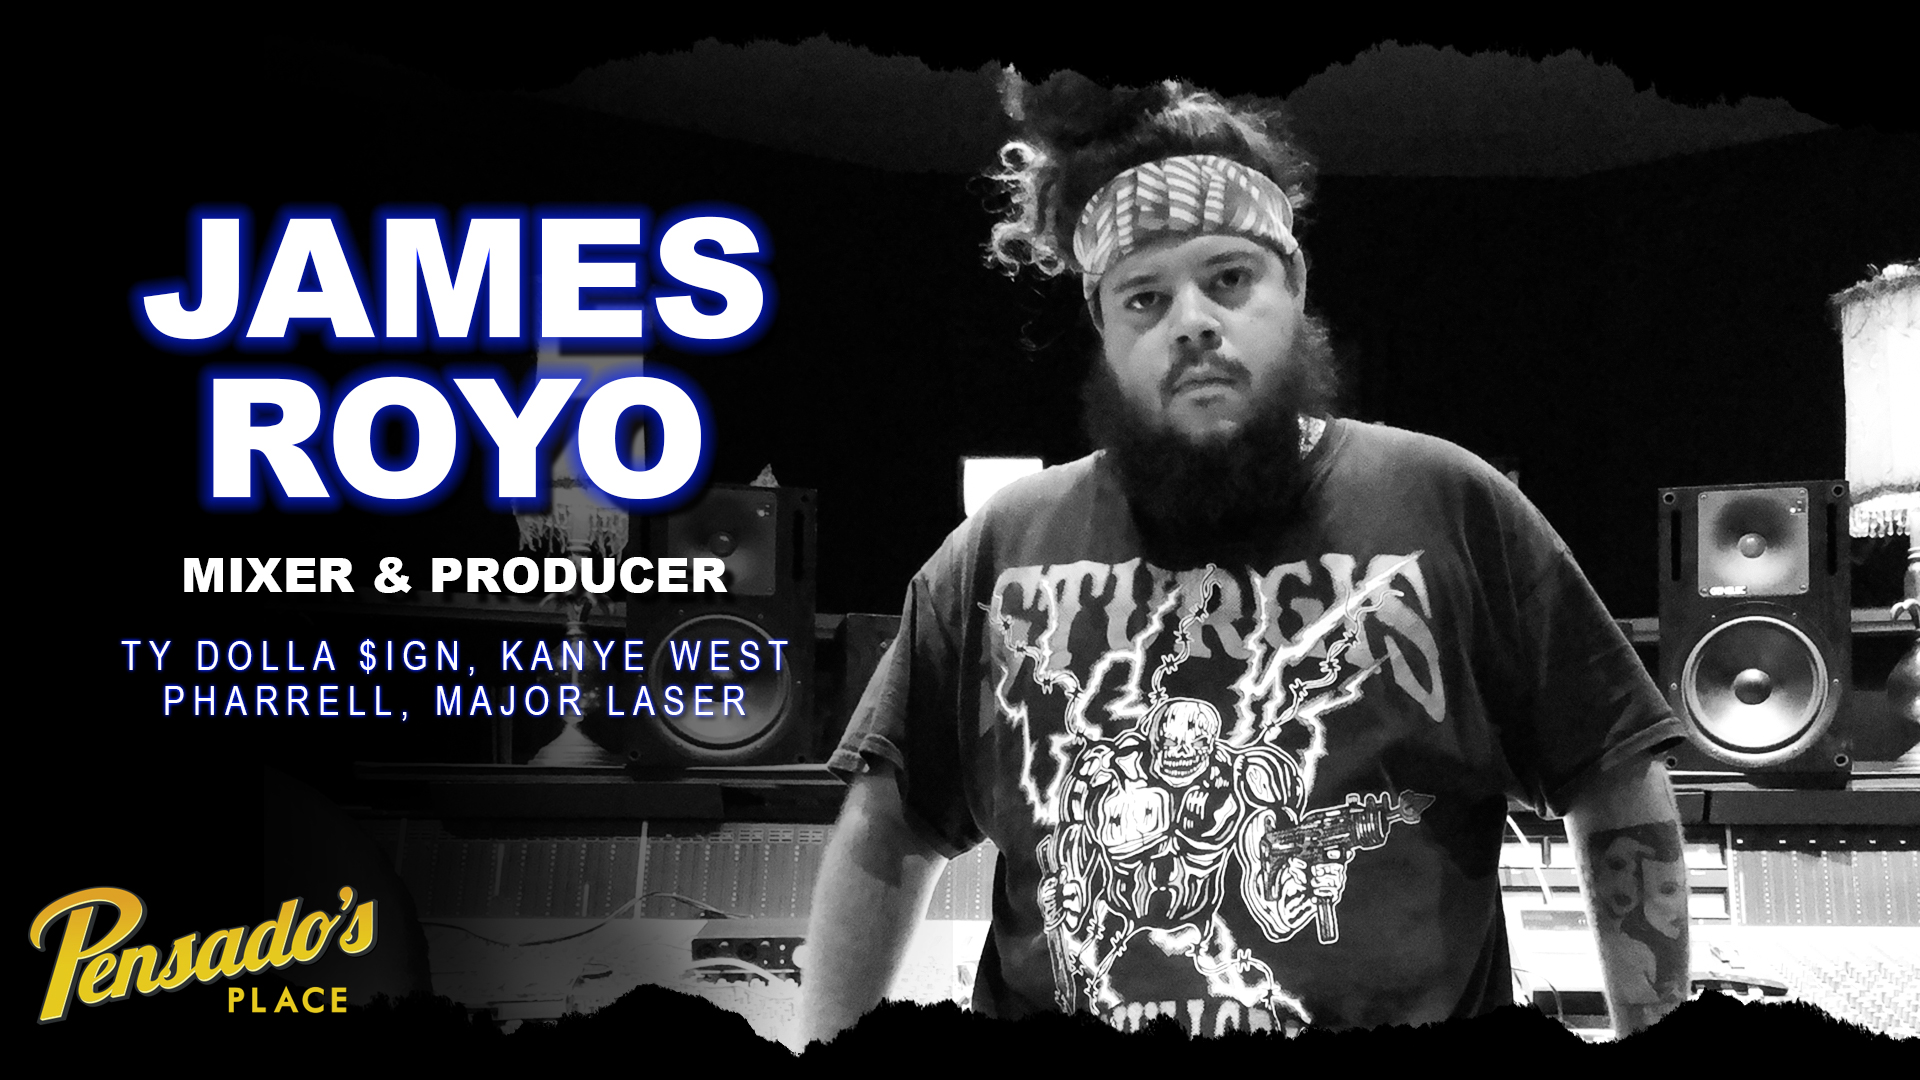 Ty Dolla $ign Producer / Mixer, James Royo